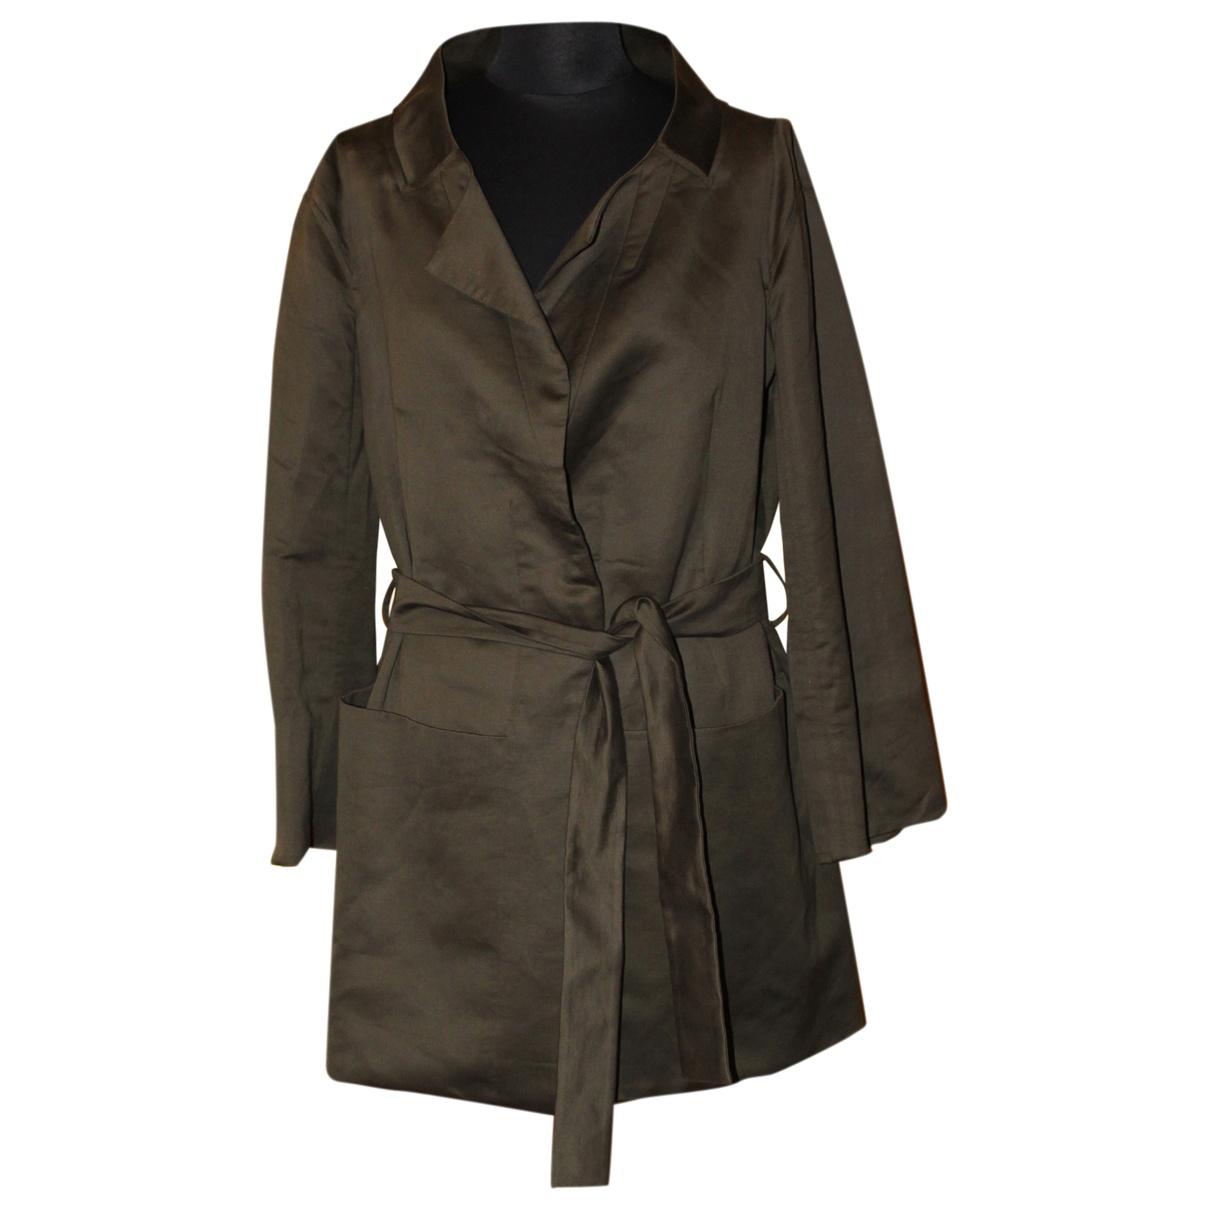 Chloé N Brown Linen coat for Women L International